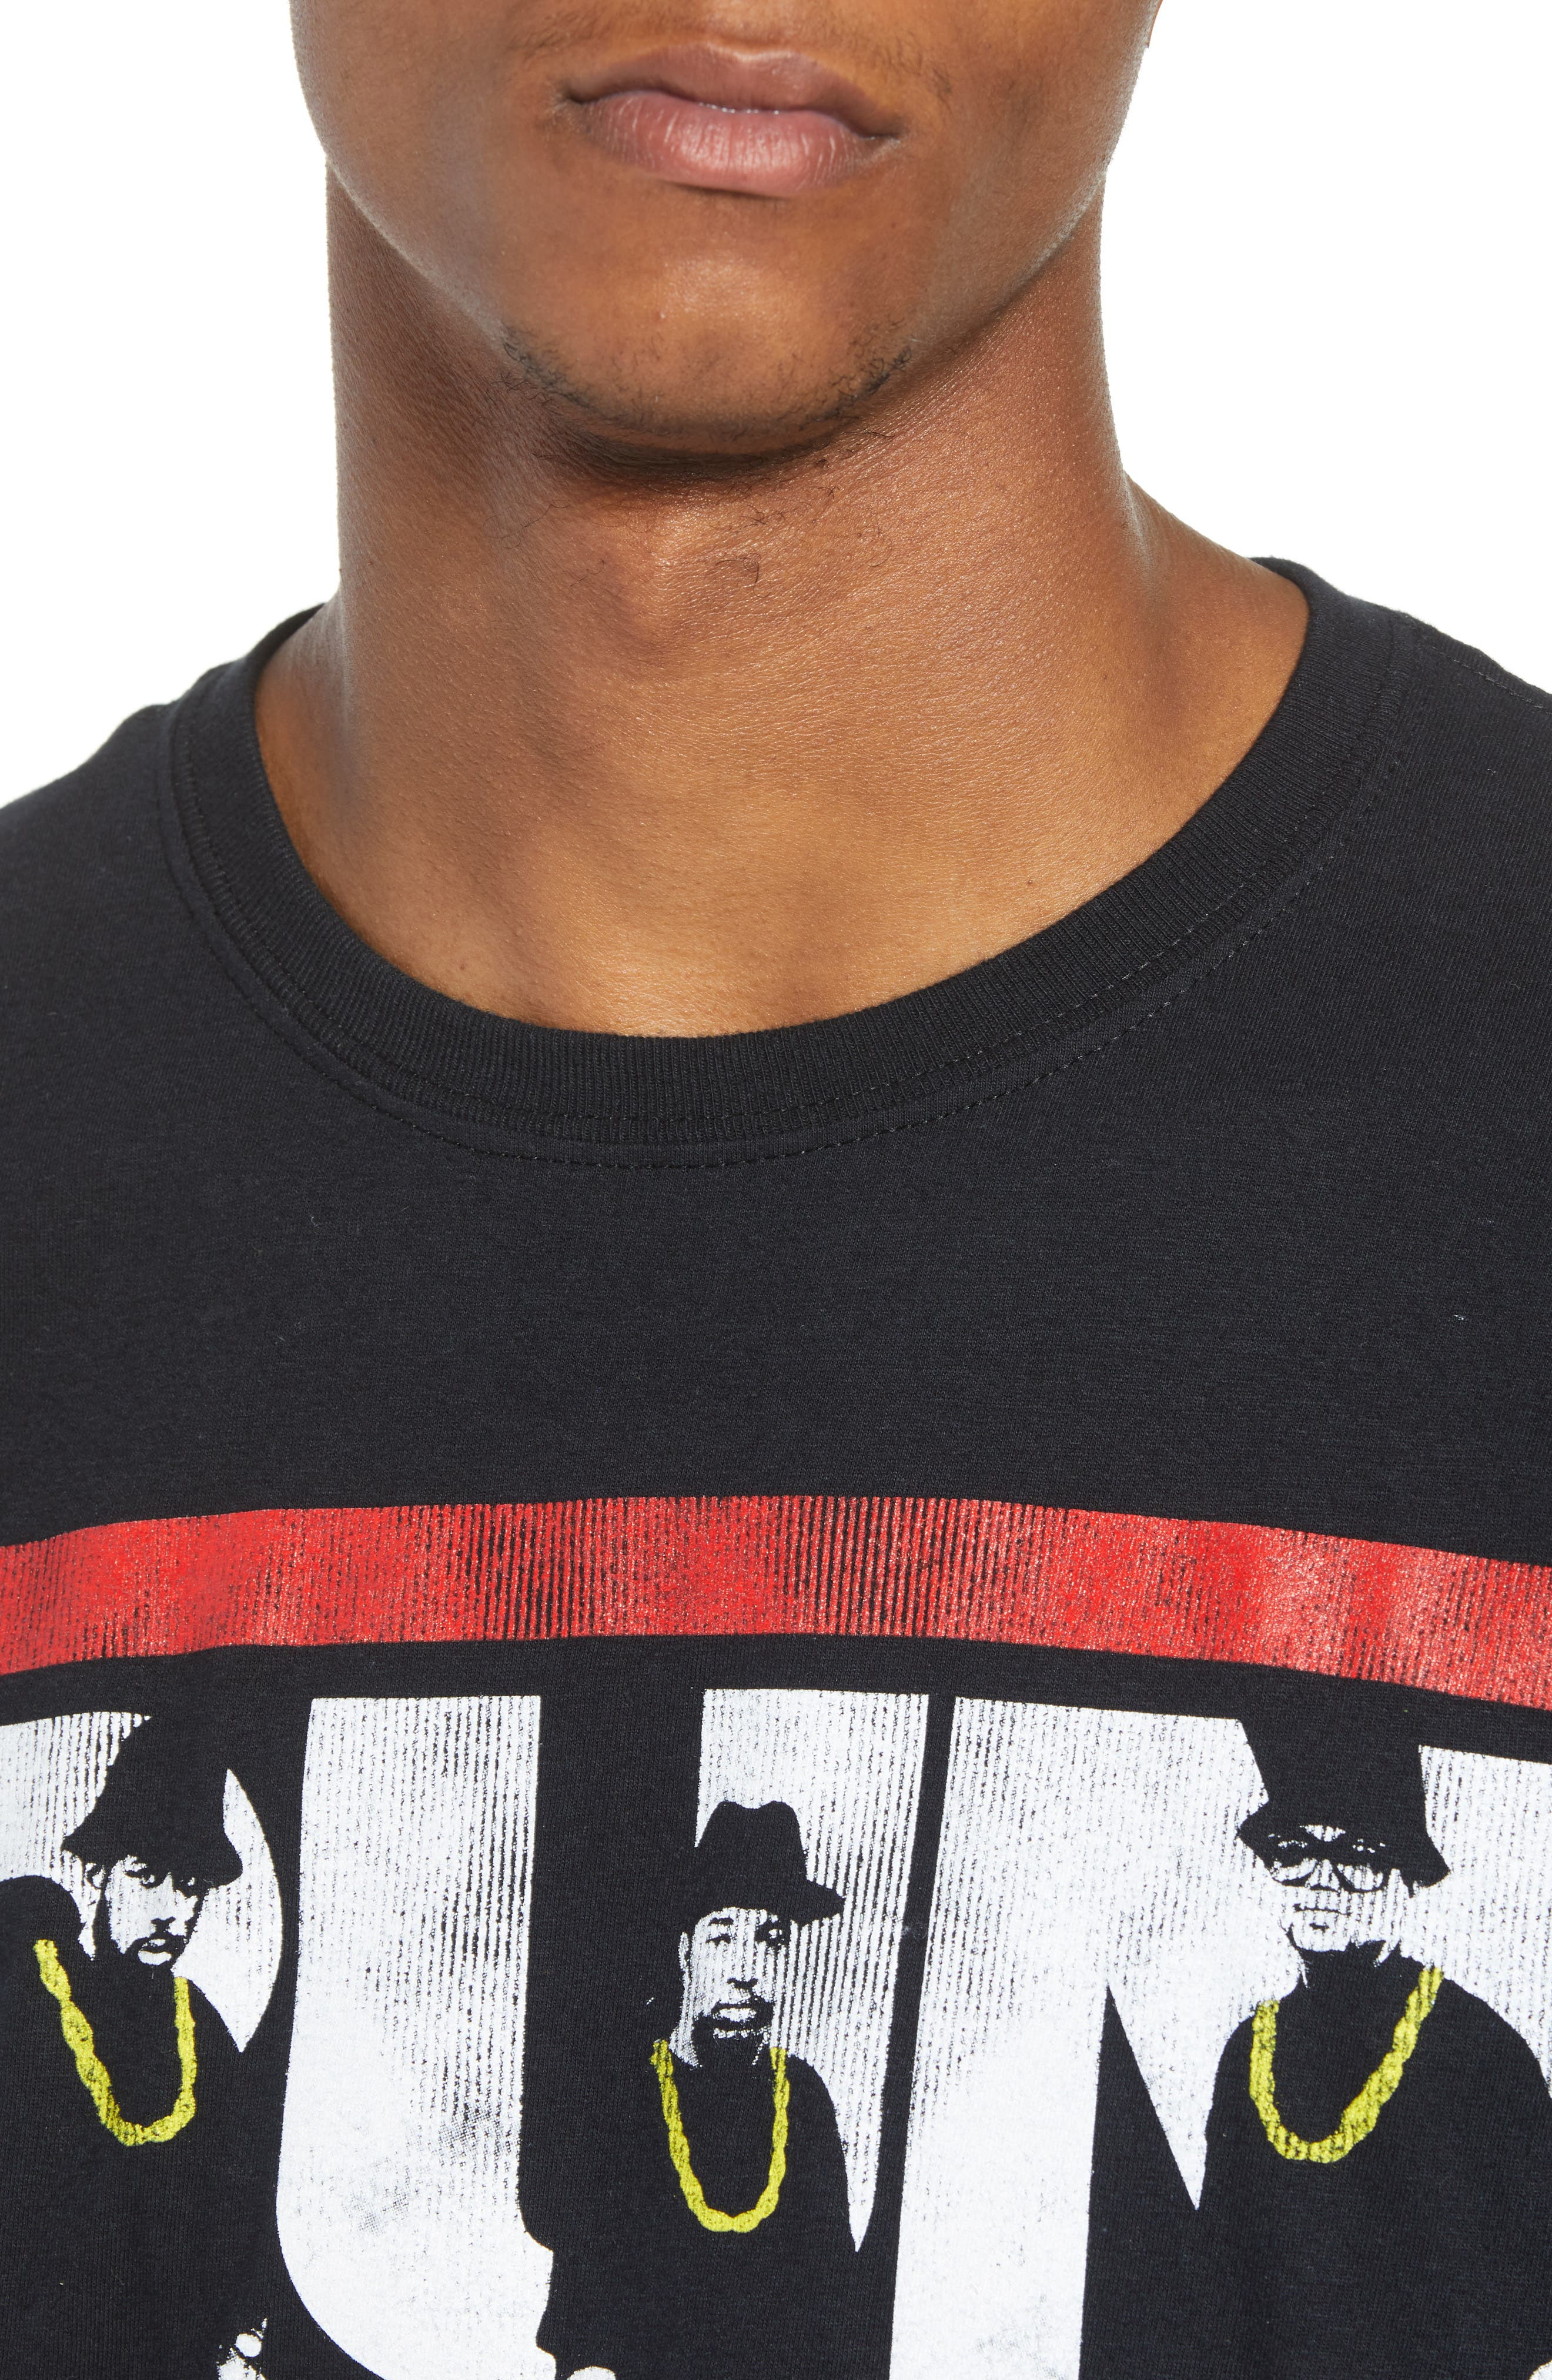 Run-DMC T-Shirt,                             Alternate thumbnail 4, color,                             Black Tee Run Dmc